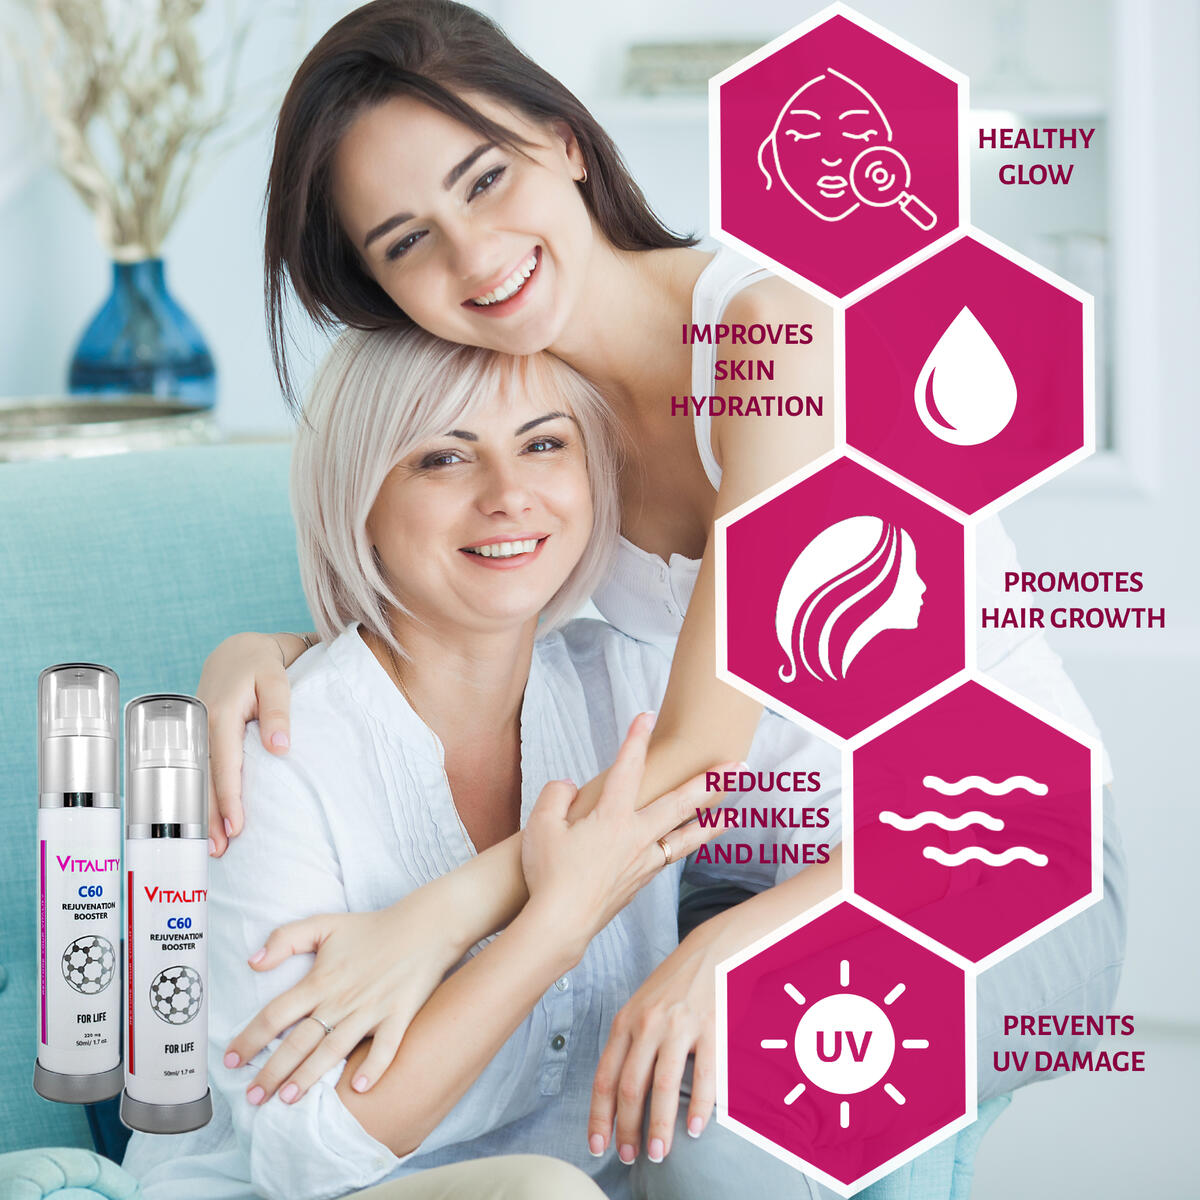 Vitality Co. Higher Potency 440mg   100% Organic C60 in Olive Oil   C-60 Fullerene Supplement  No-Mess Travel-Friendly Spray Bottle